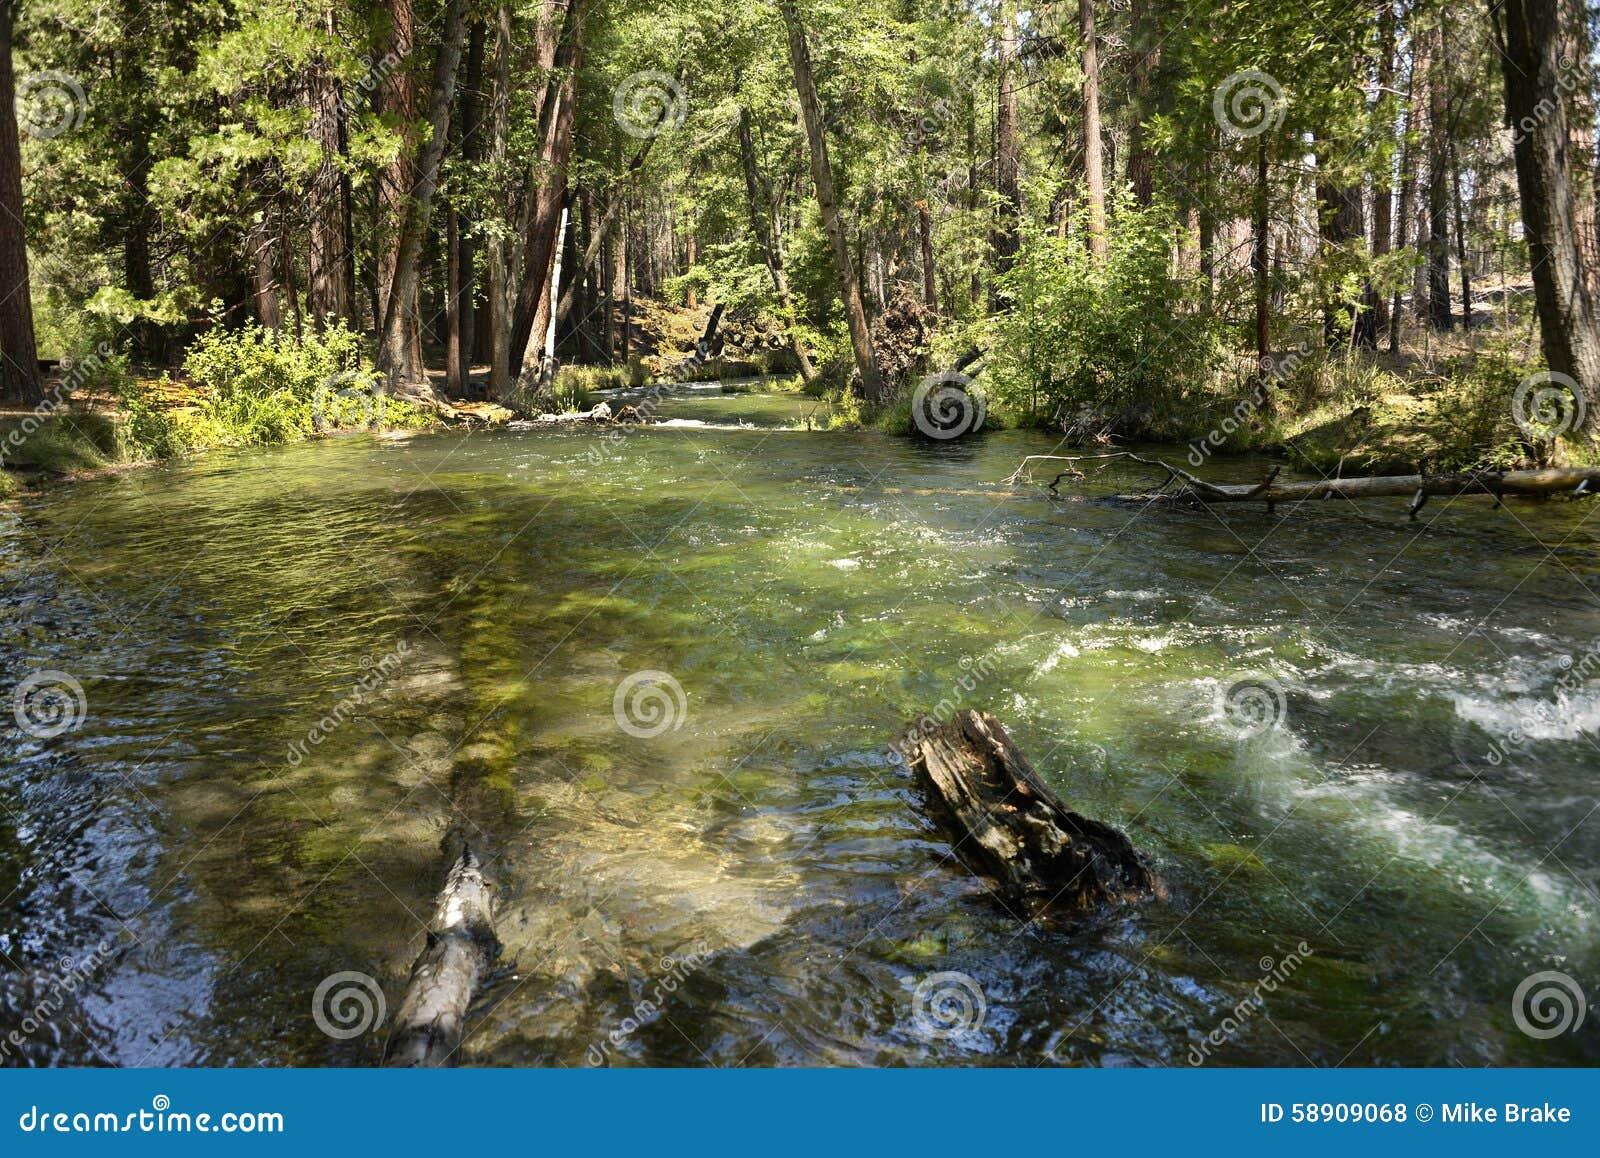 Hat creek in lassen national park california stock photo for Hat creek fishing